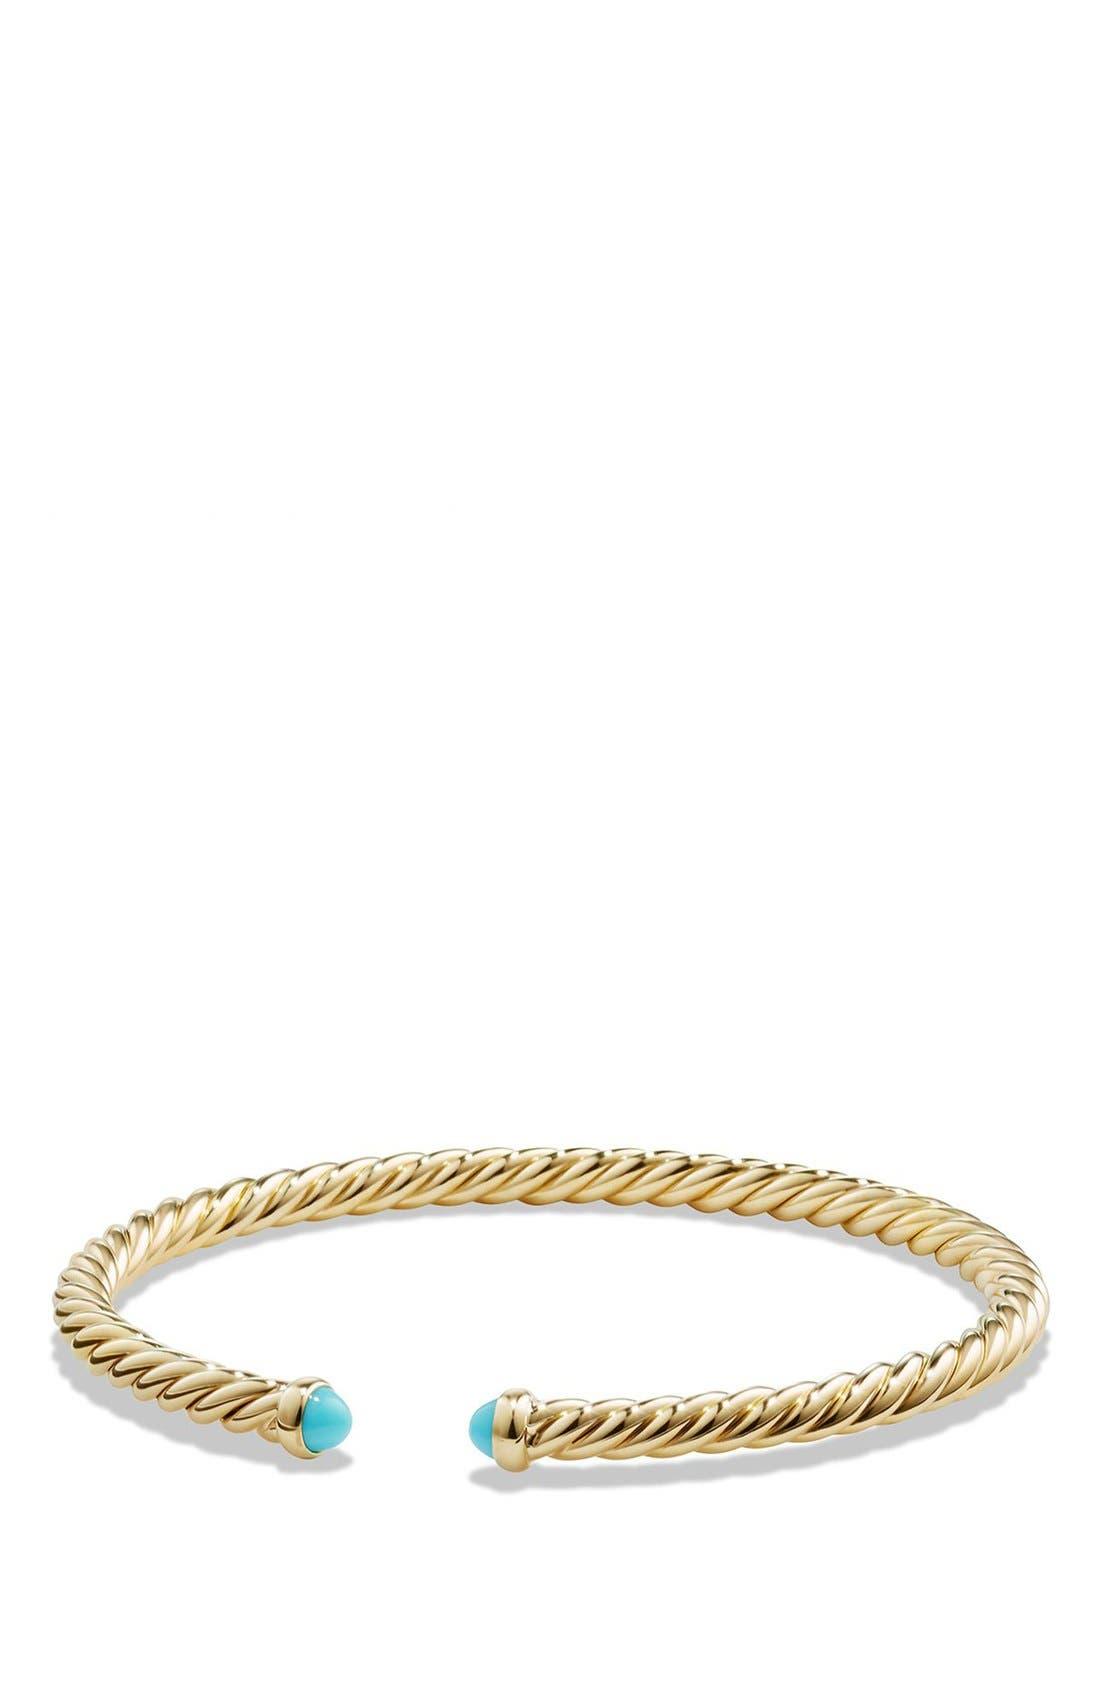 David Yurman 'Cable Classics' Cable Spira Bracelet in 18K Gold